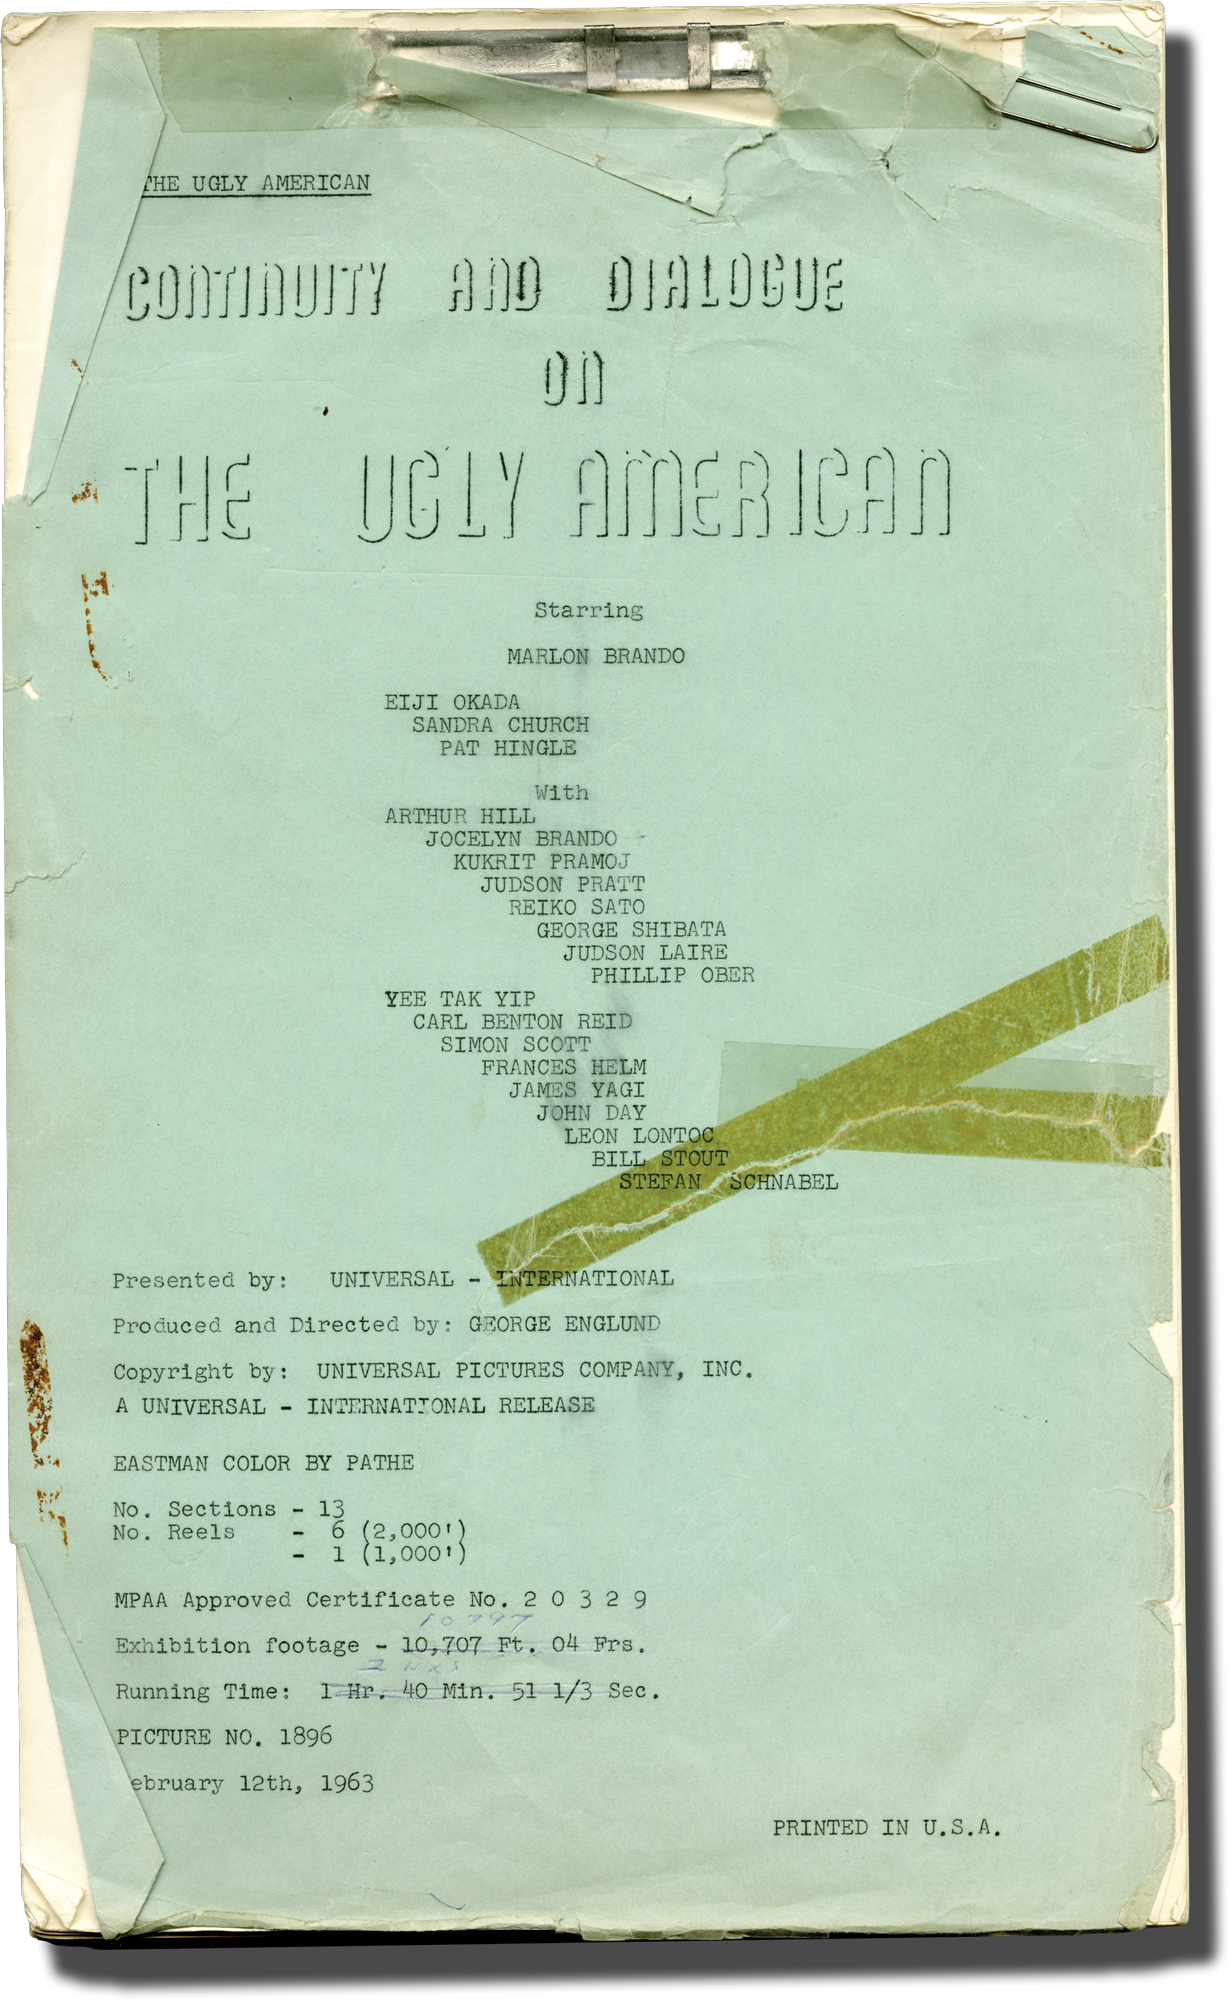 Film Script: Manuscripts & Paper Collectibles - AbeBooks